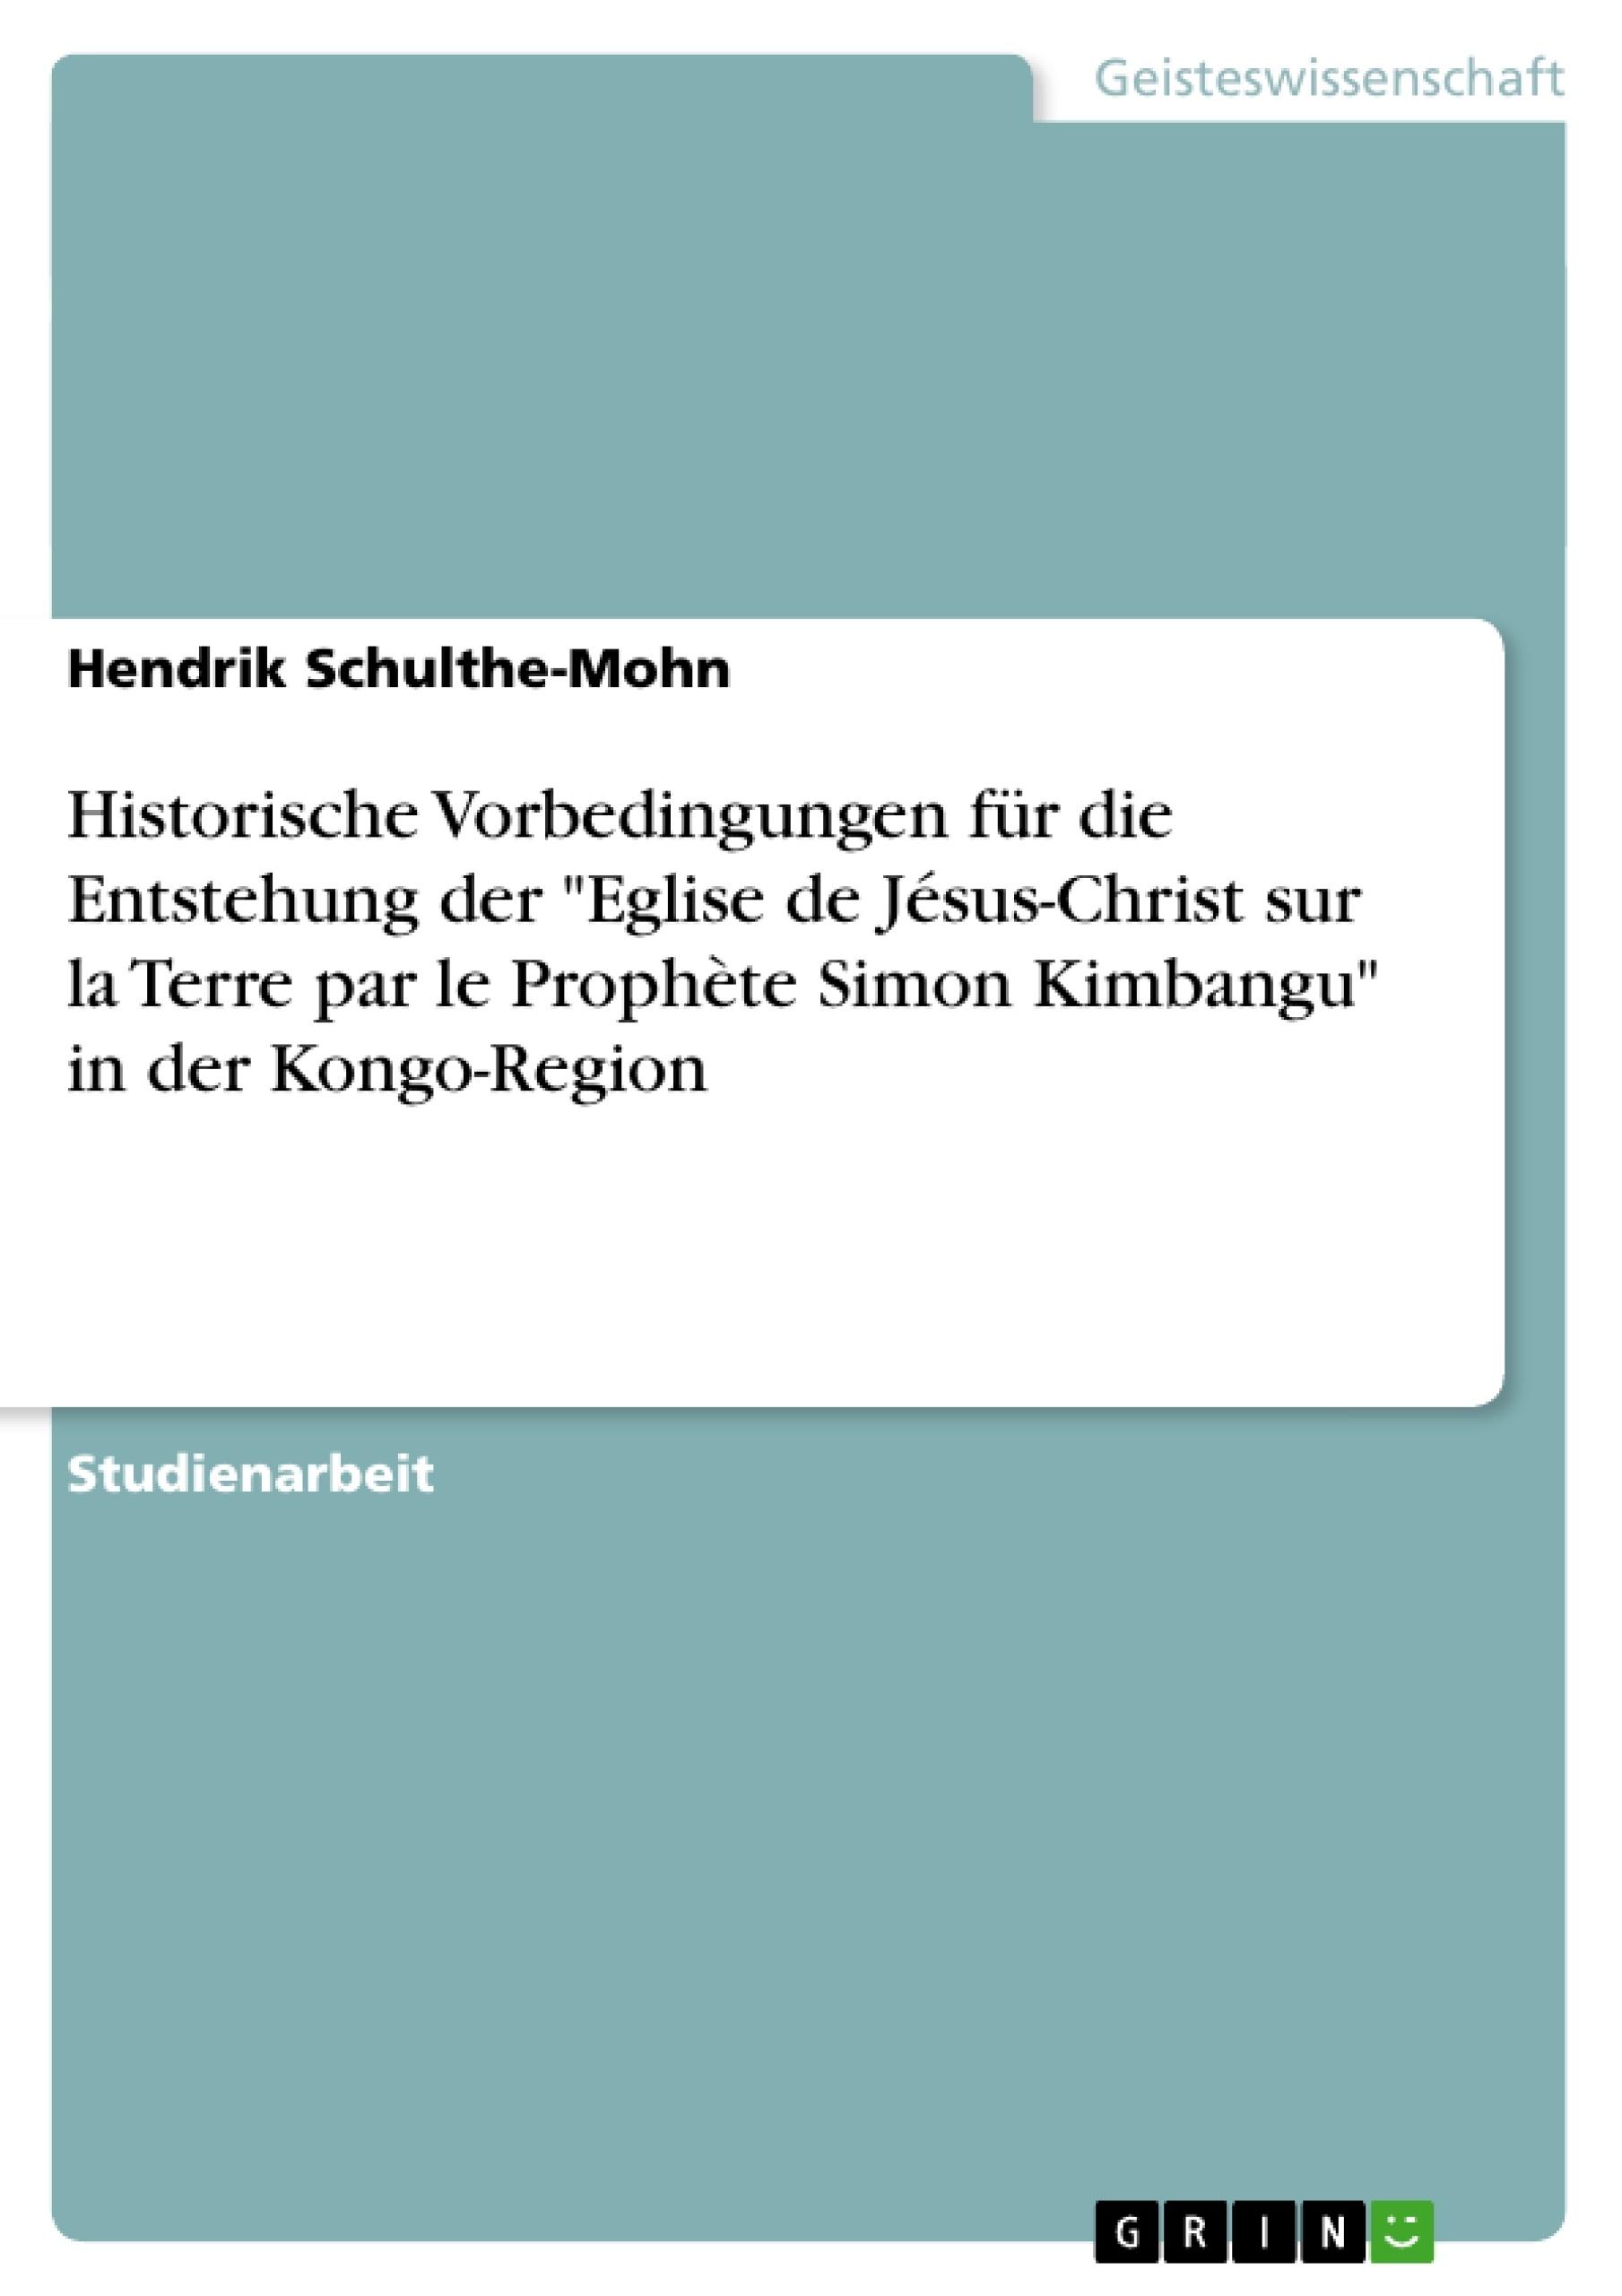 "Titel: Historische Vorbedingungen für die Entstehung der ""Eglise de Jésus-Christ sur la Terre par le Prophète Simon Kimbangu"" in der Kongo-Region"